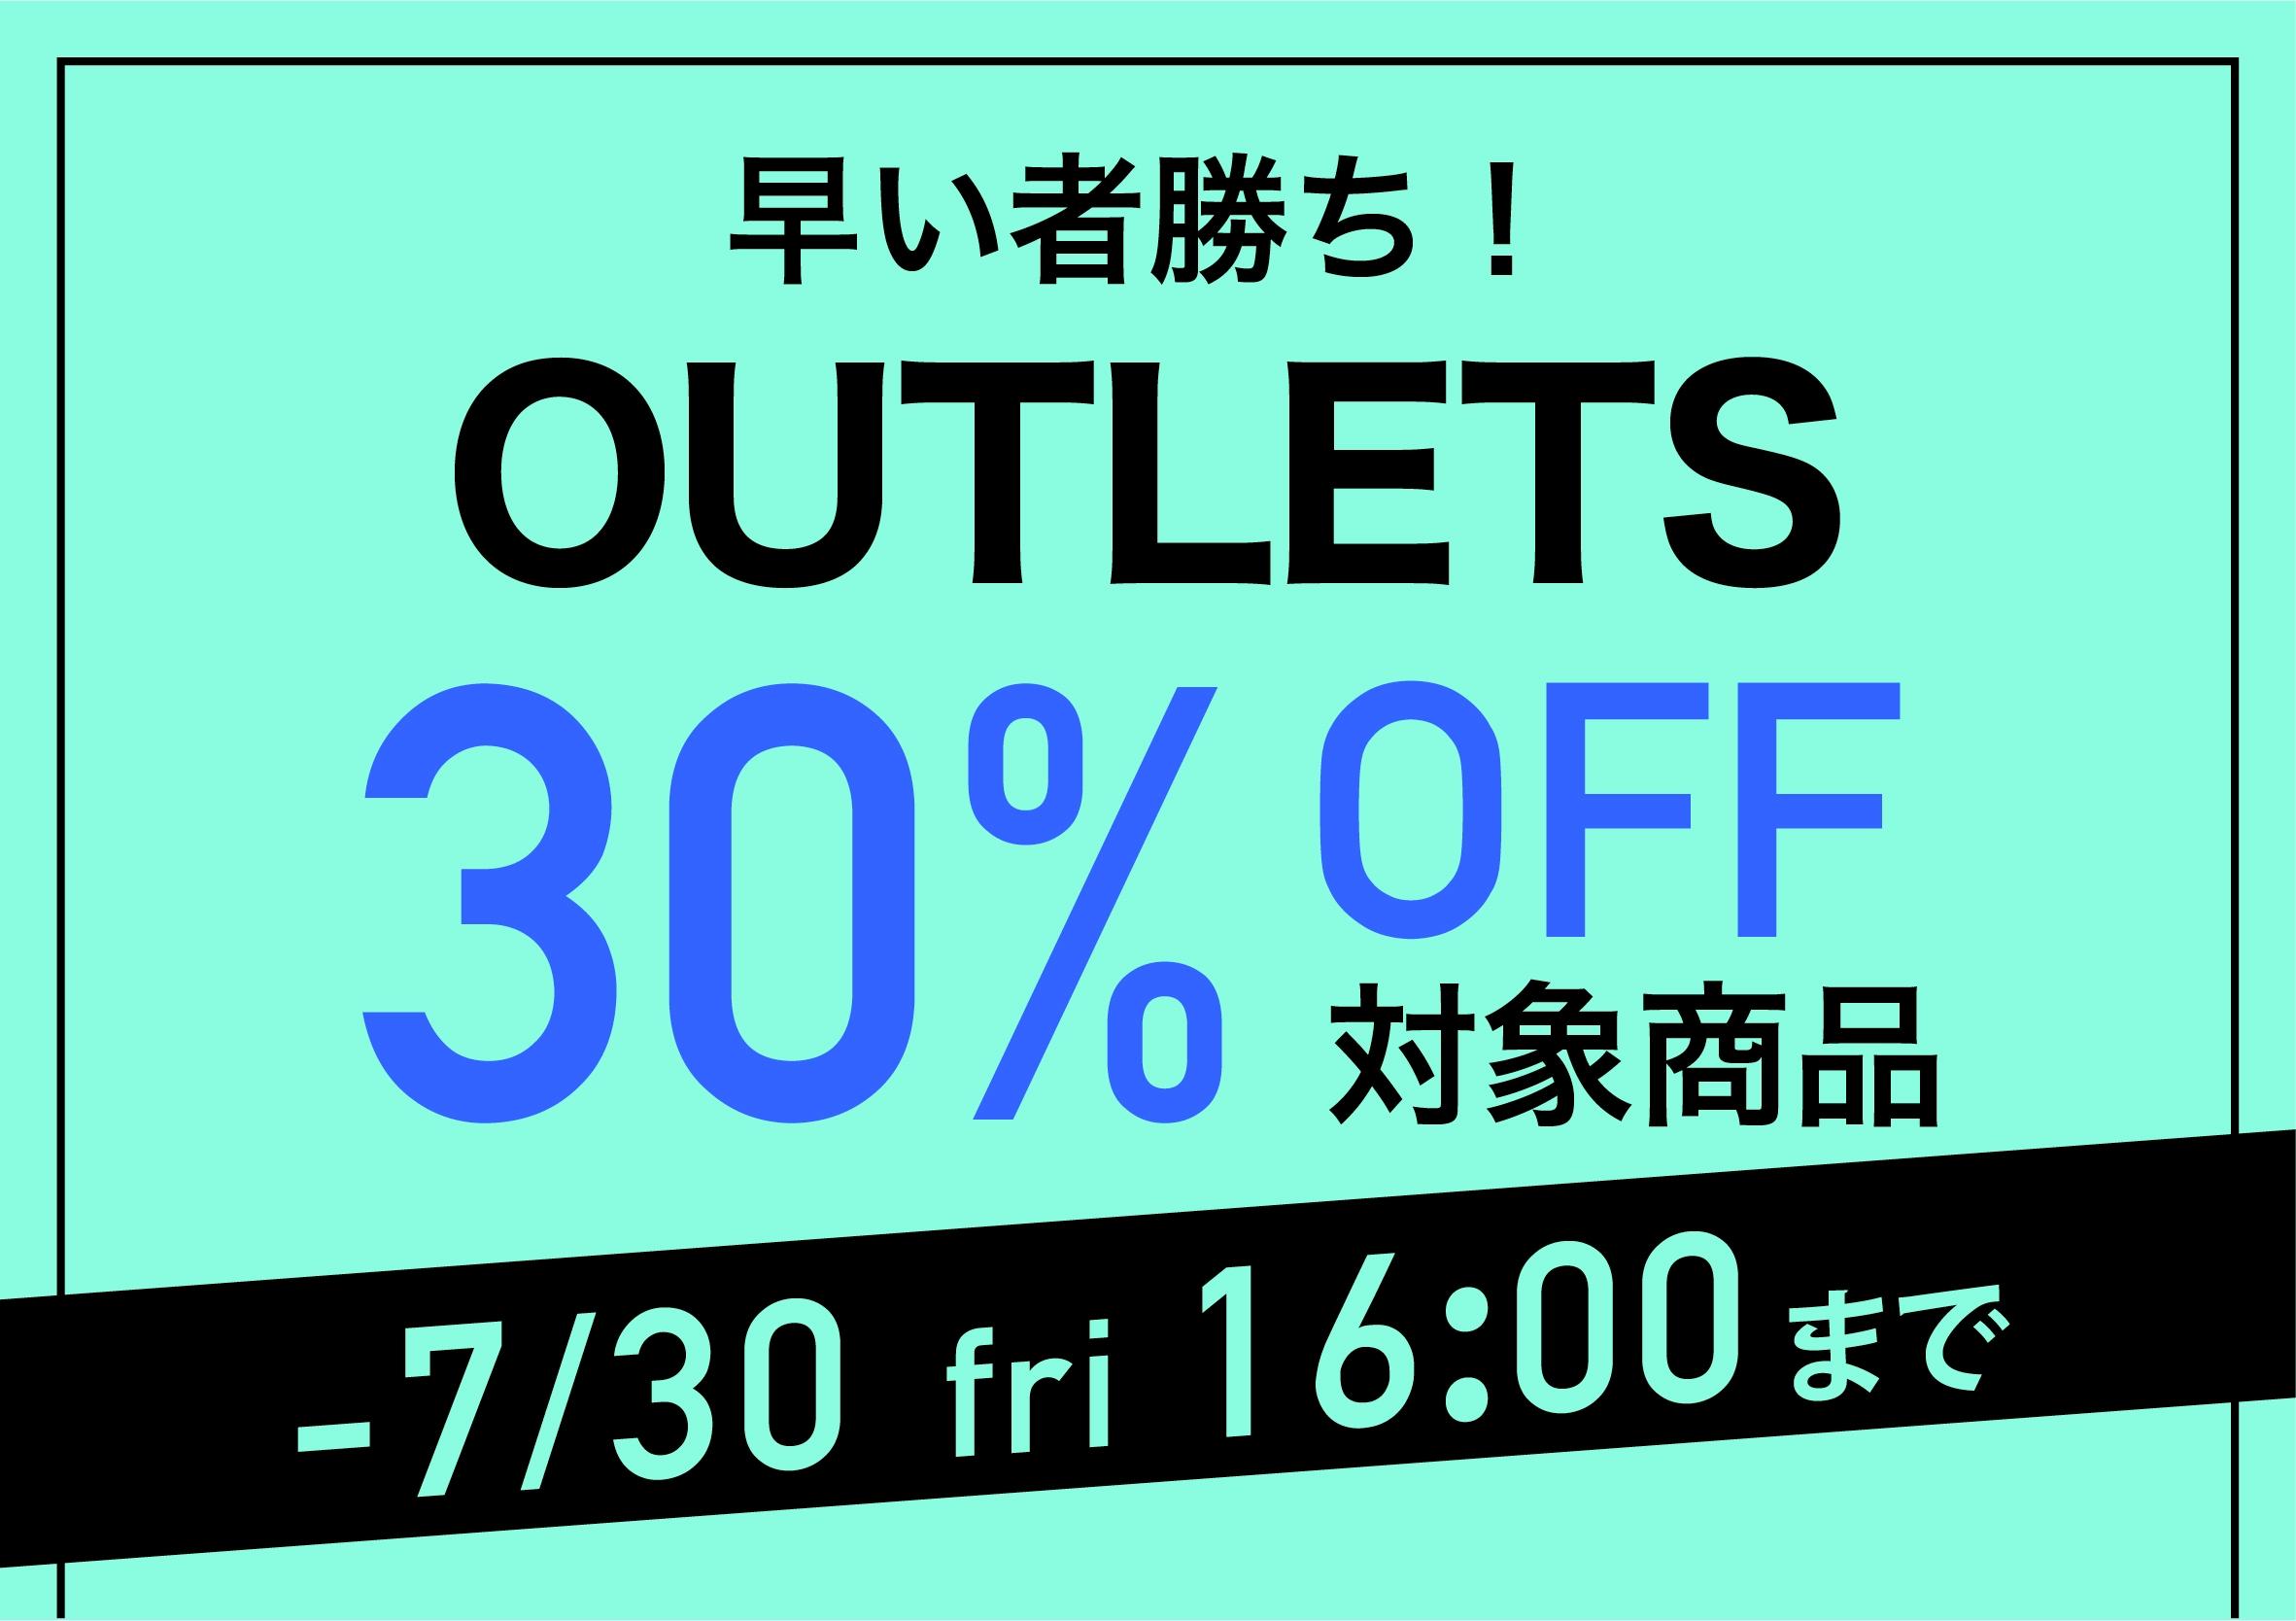 37%OFF 330円お得